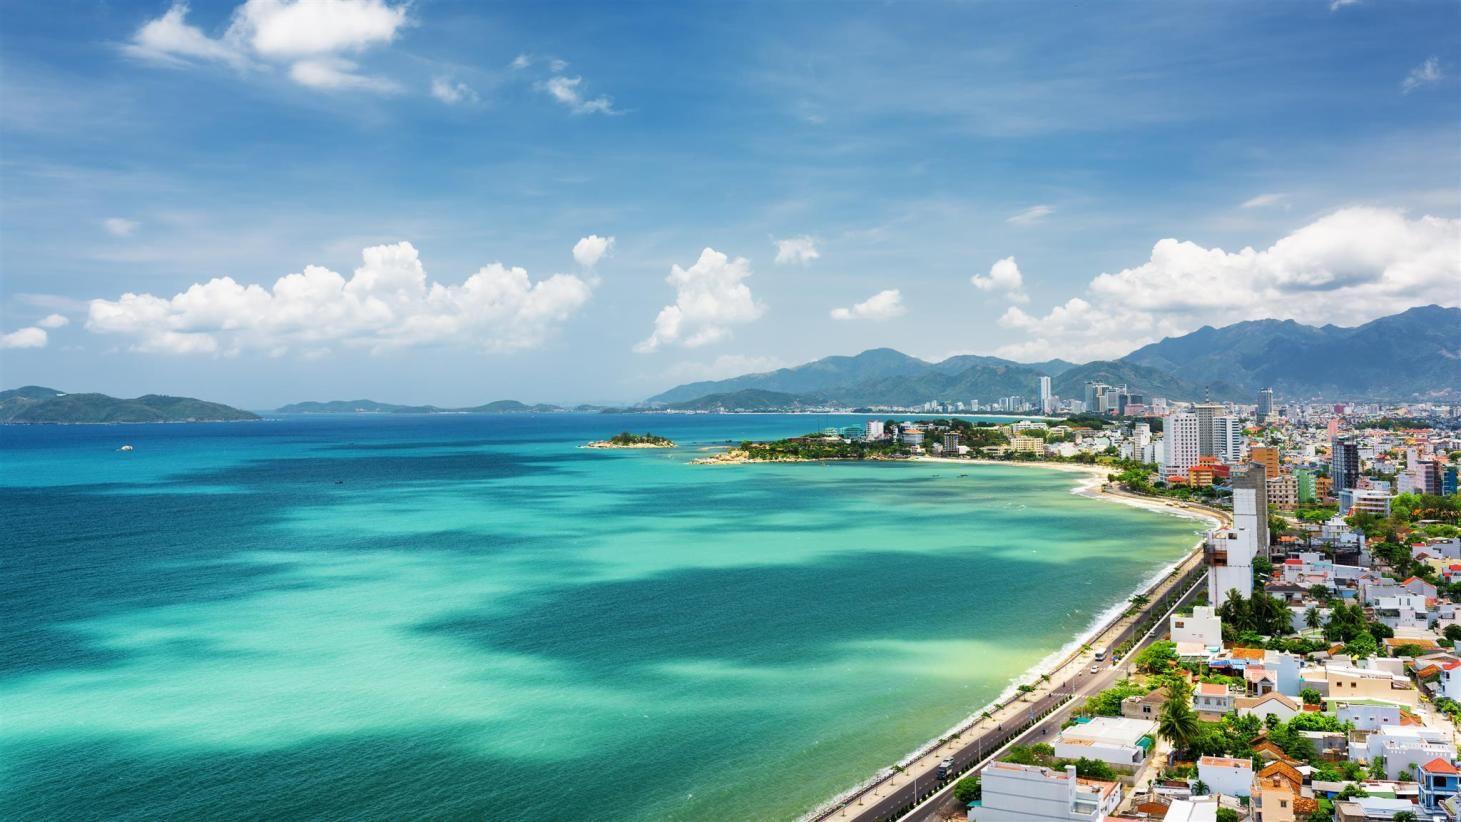 Review Kinh nghiệm du lịch Nha Trang